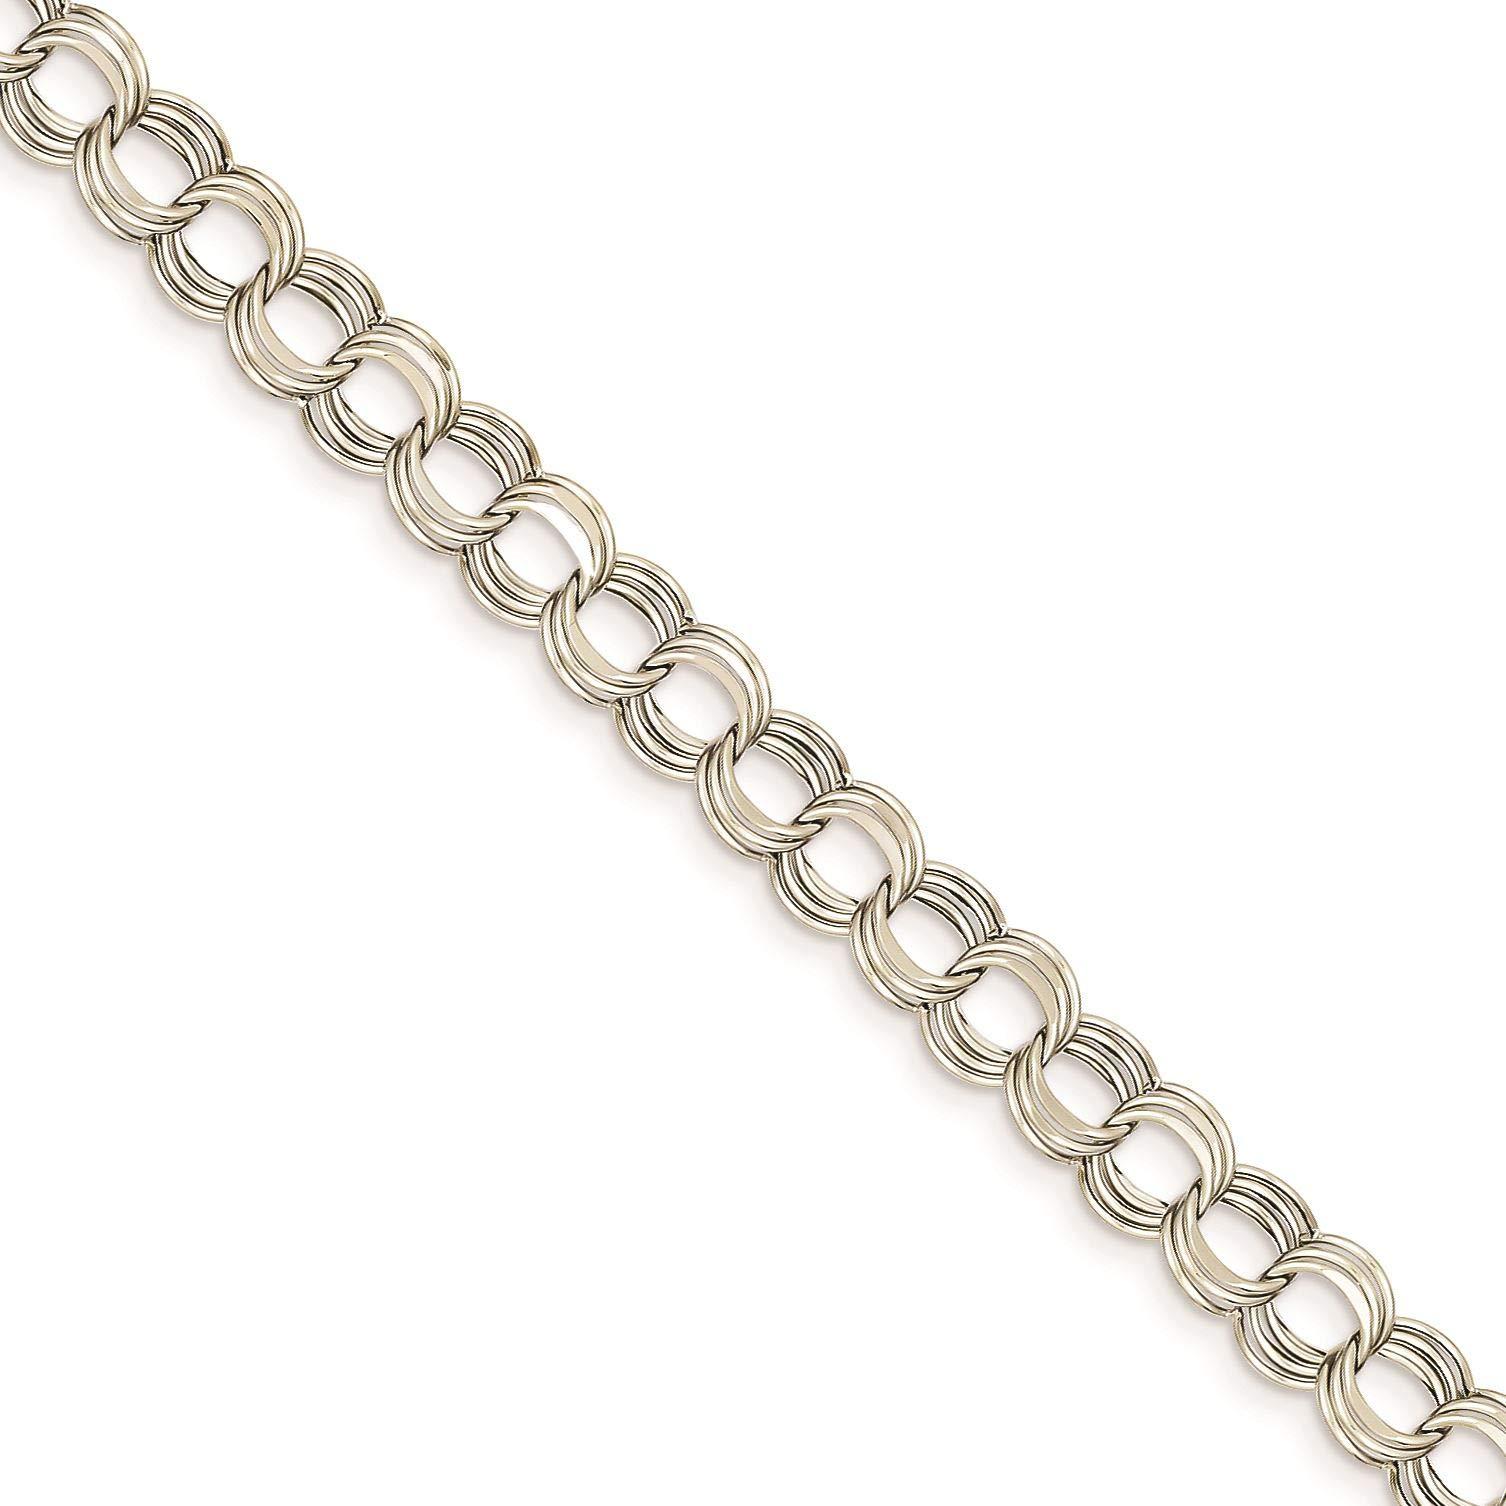 14K White Gold Lite 7 MM Triple Link Charm Bracelet, 7.25''